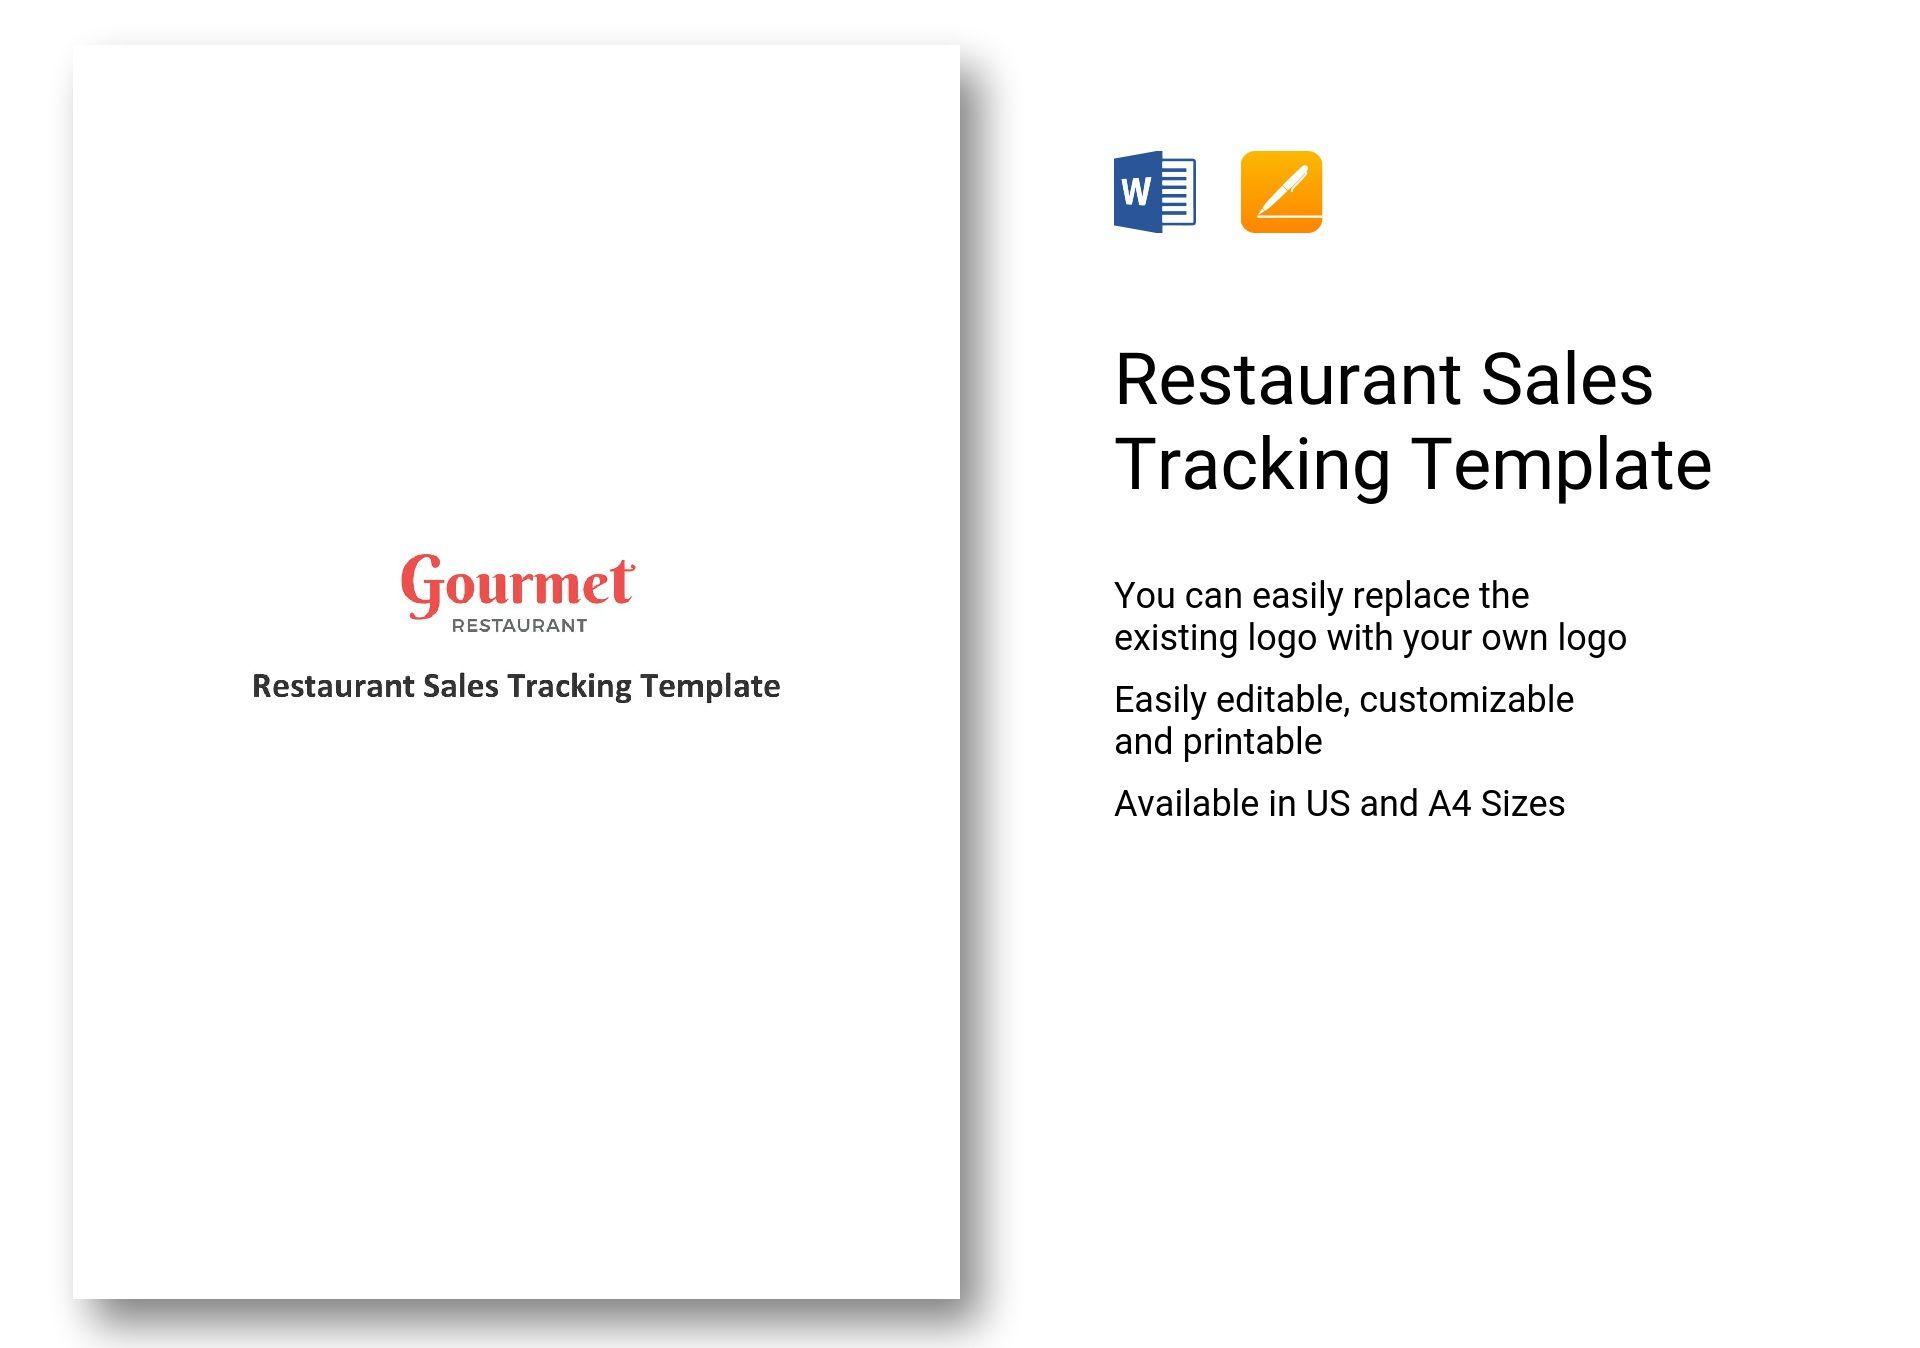 Restaurant Sales Tracking